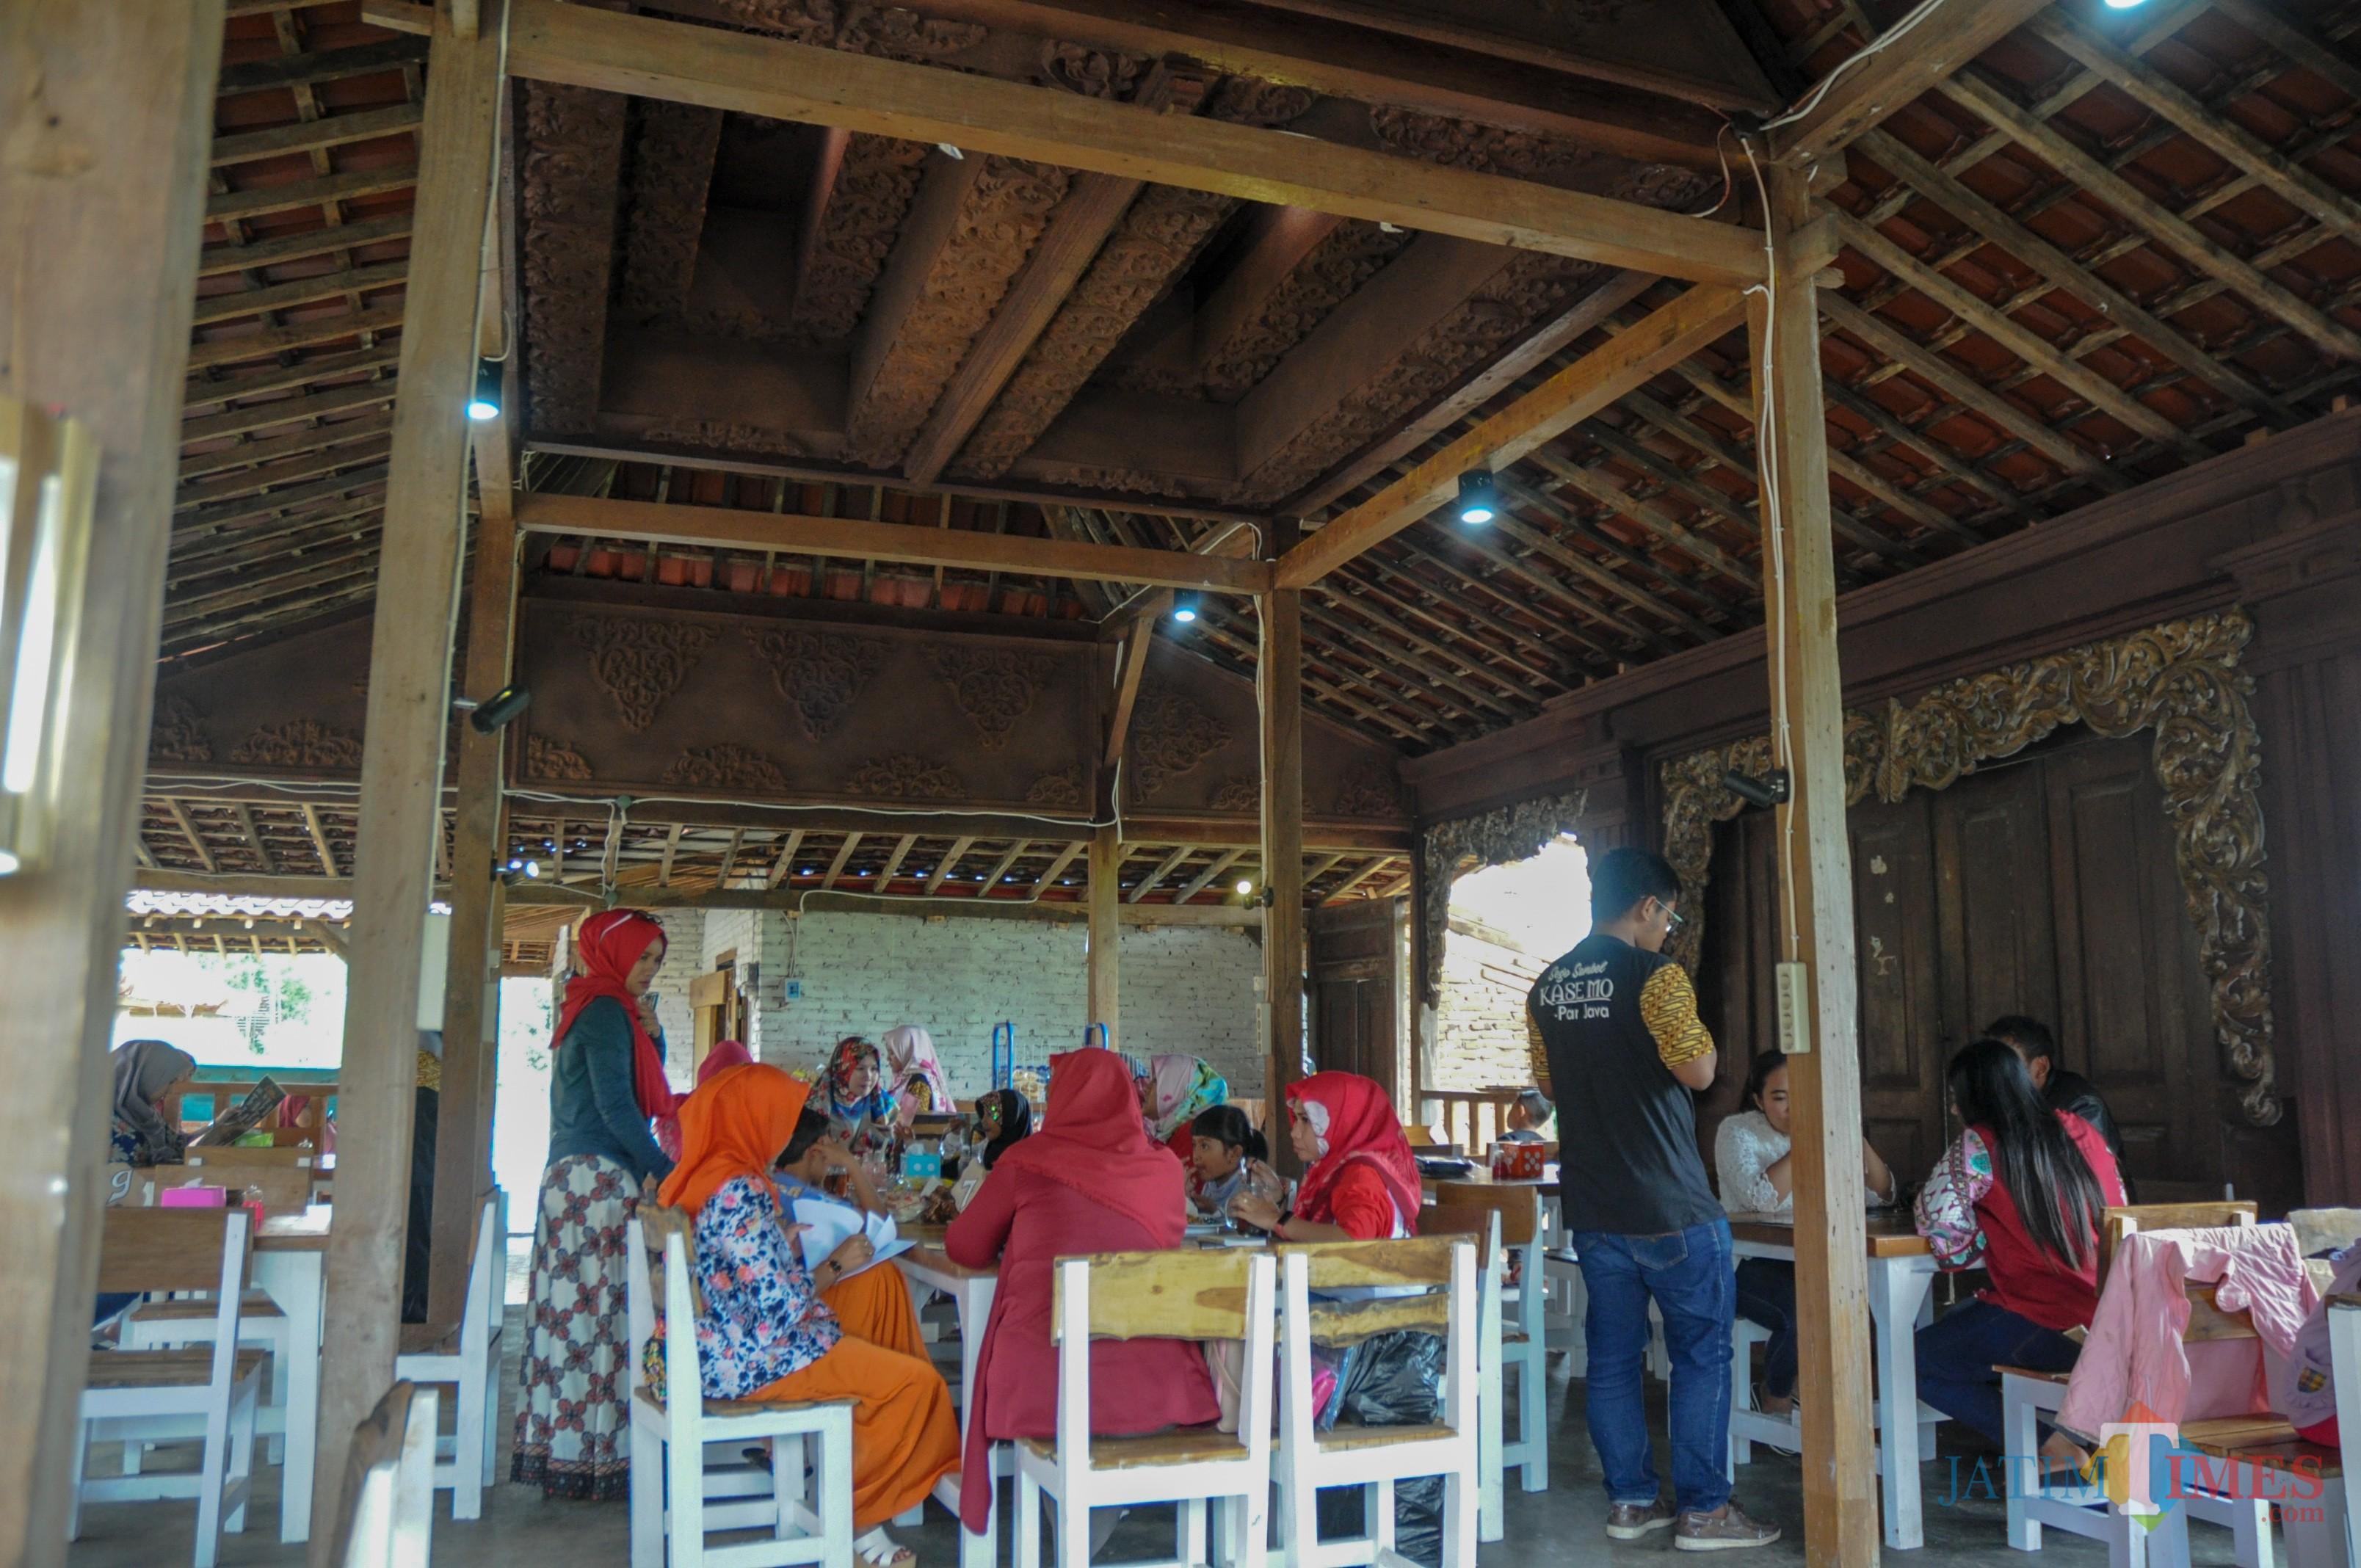 Suasana tradisional di warung sego sambal kasemo (Foto : Lukmanul Hakim/MalangTIMES